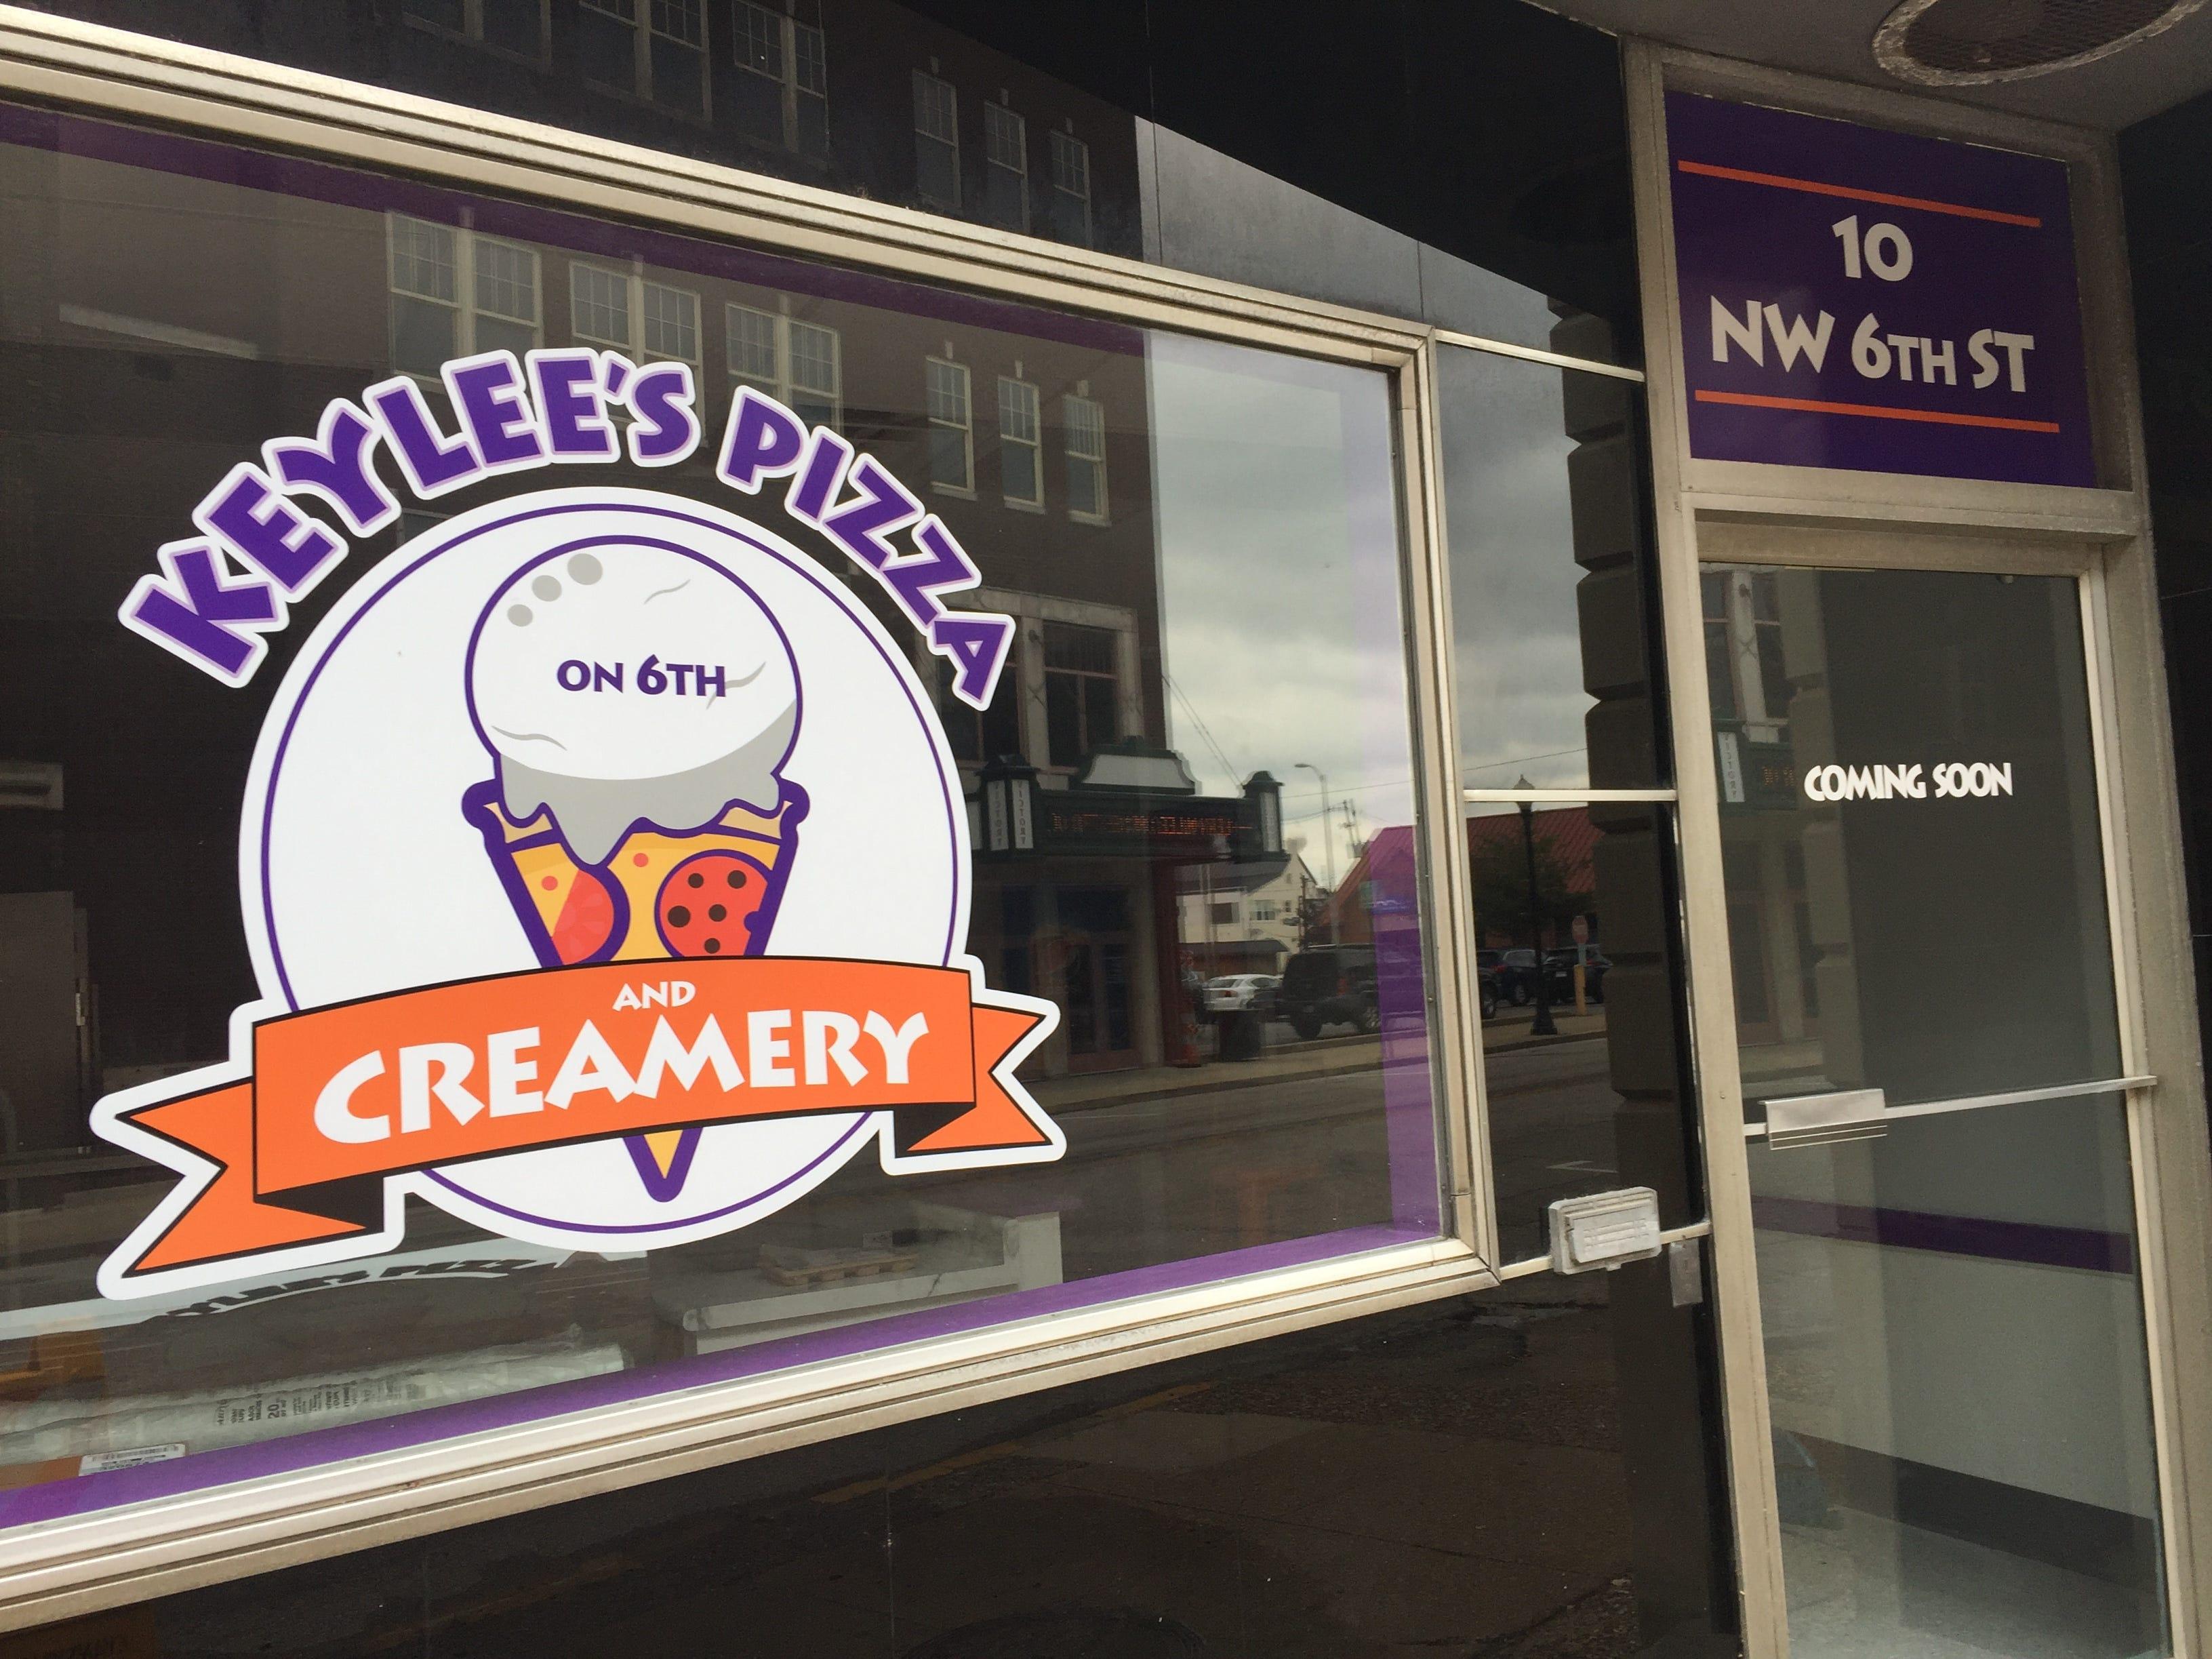 Keylee's Pizza and Creamery